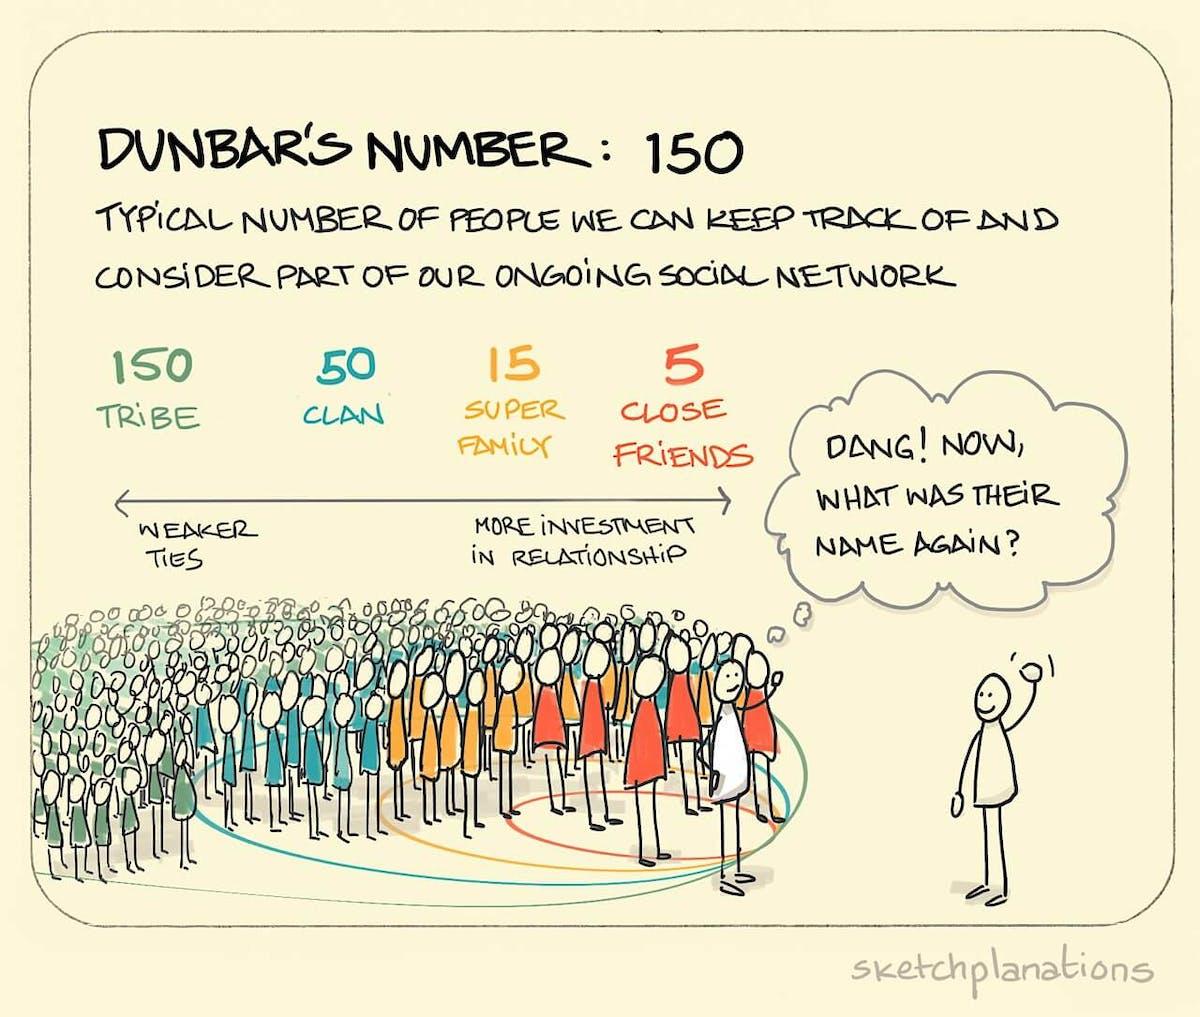 Dunbar's number: 150 - Sketchplanations